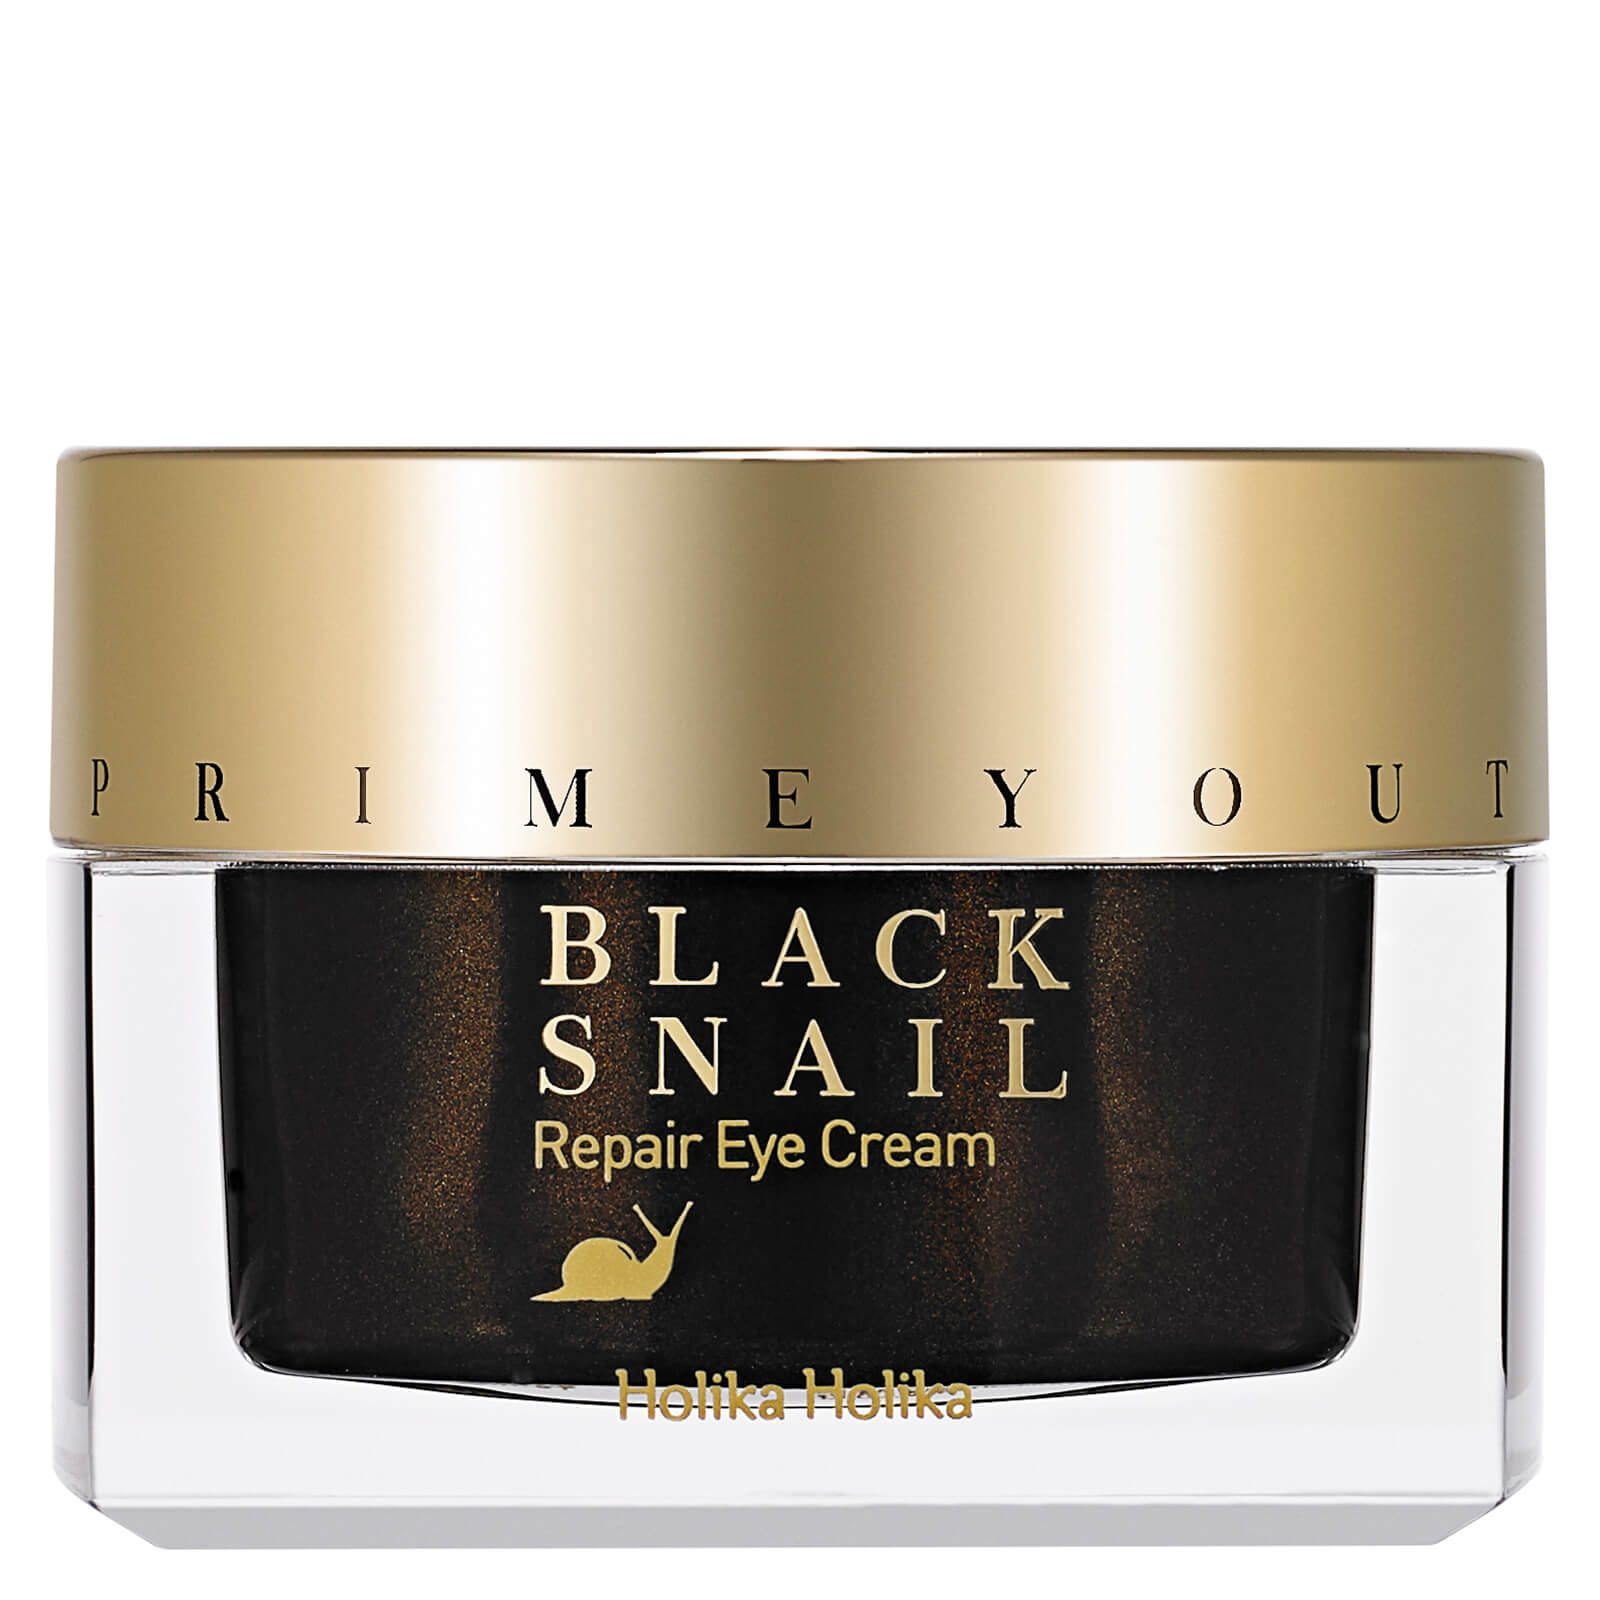 Купить Восстанавливающий крем для глаз с муцином черной улитки Holika Holika Prime Youth Black Snail Repair Eye Cream